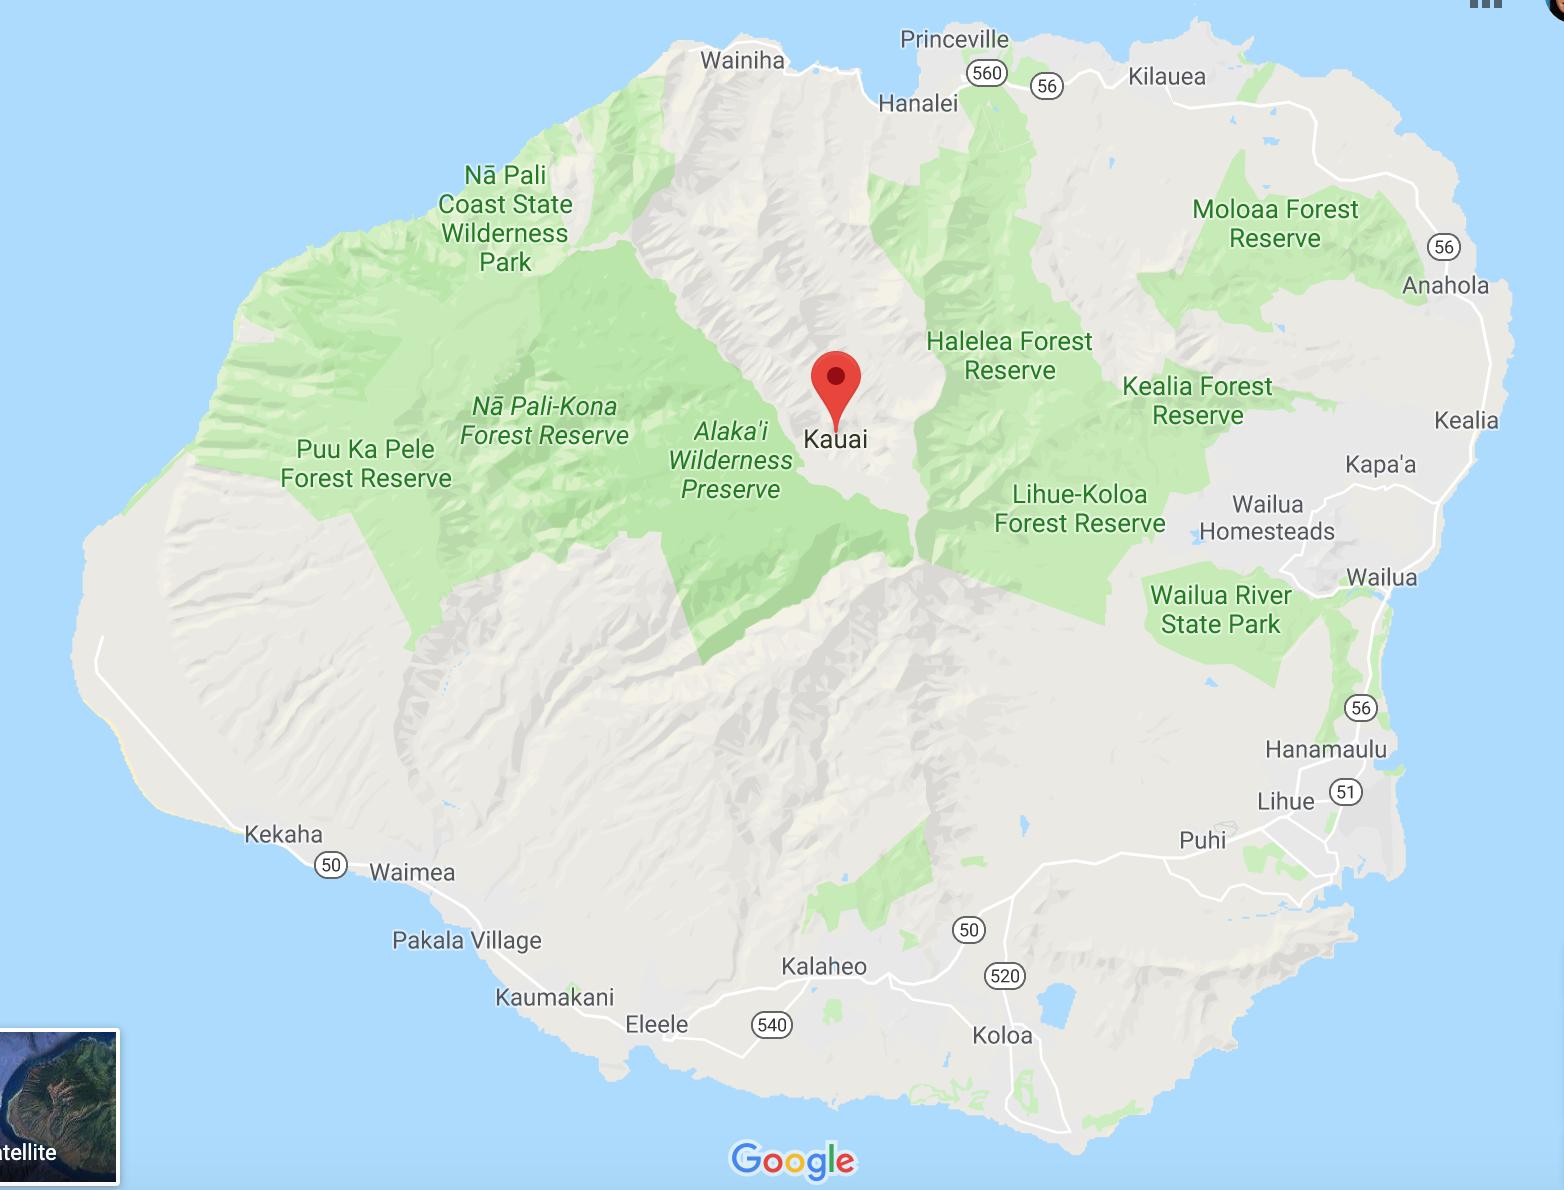 Kauai Police Investigate Alleged Cheating, Cover-Up In Ranks ... on molokai map, maui map, marshall islands hawaii map, kapaa hawaii map, kailua hawaii map, lanai map, kona hawaii map, kaunaoa bay hawaii map, oahu map, hilo hawaii map, lihue map, kahului hawaii map, hawaii road map, niihau hawaii map, poipu map, honolulu hawaii map, hawaii volcanoes national park map, nawiliwili hawaii map, anahulu river hawaii map, kalaupapa hawaii map,